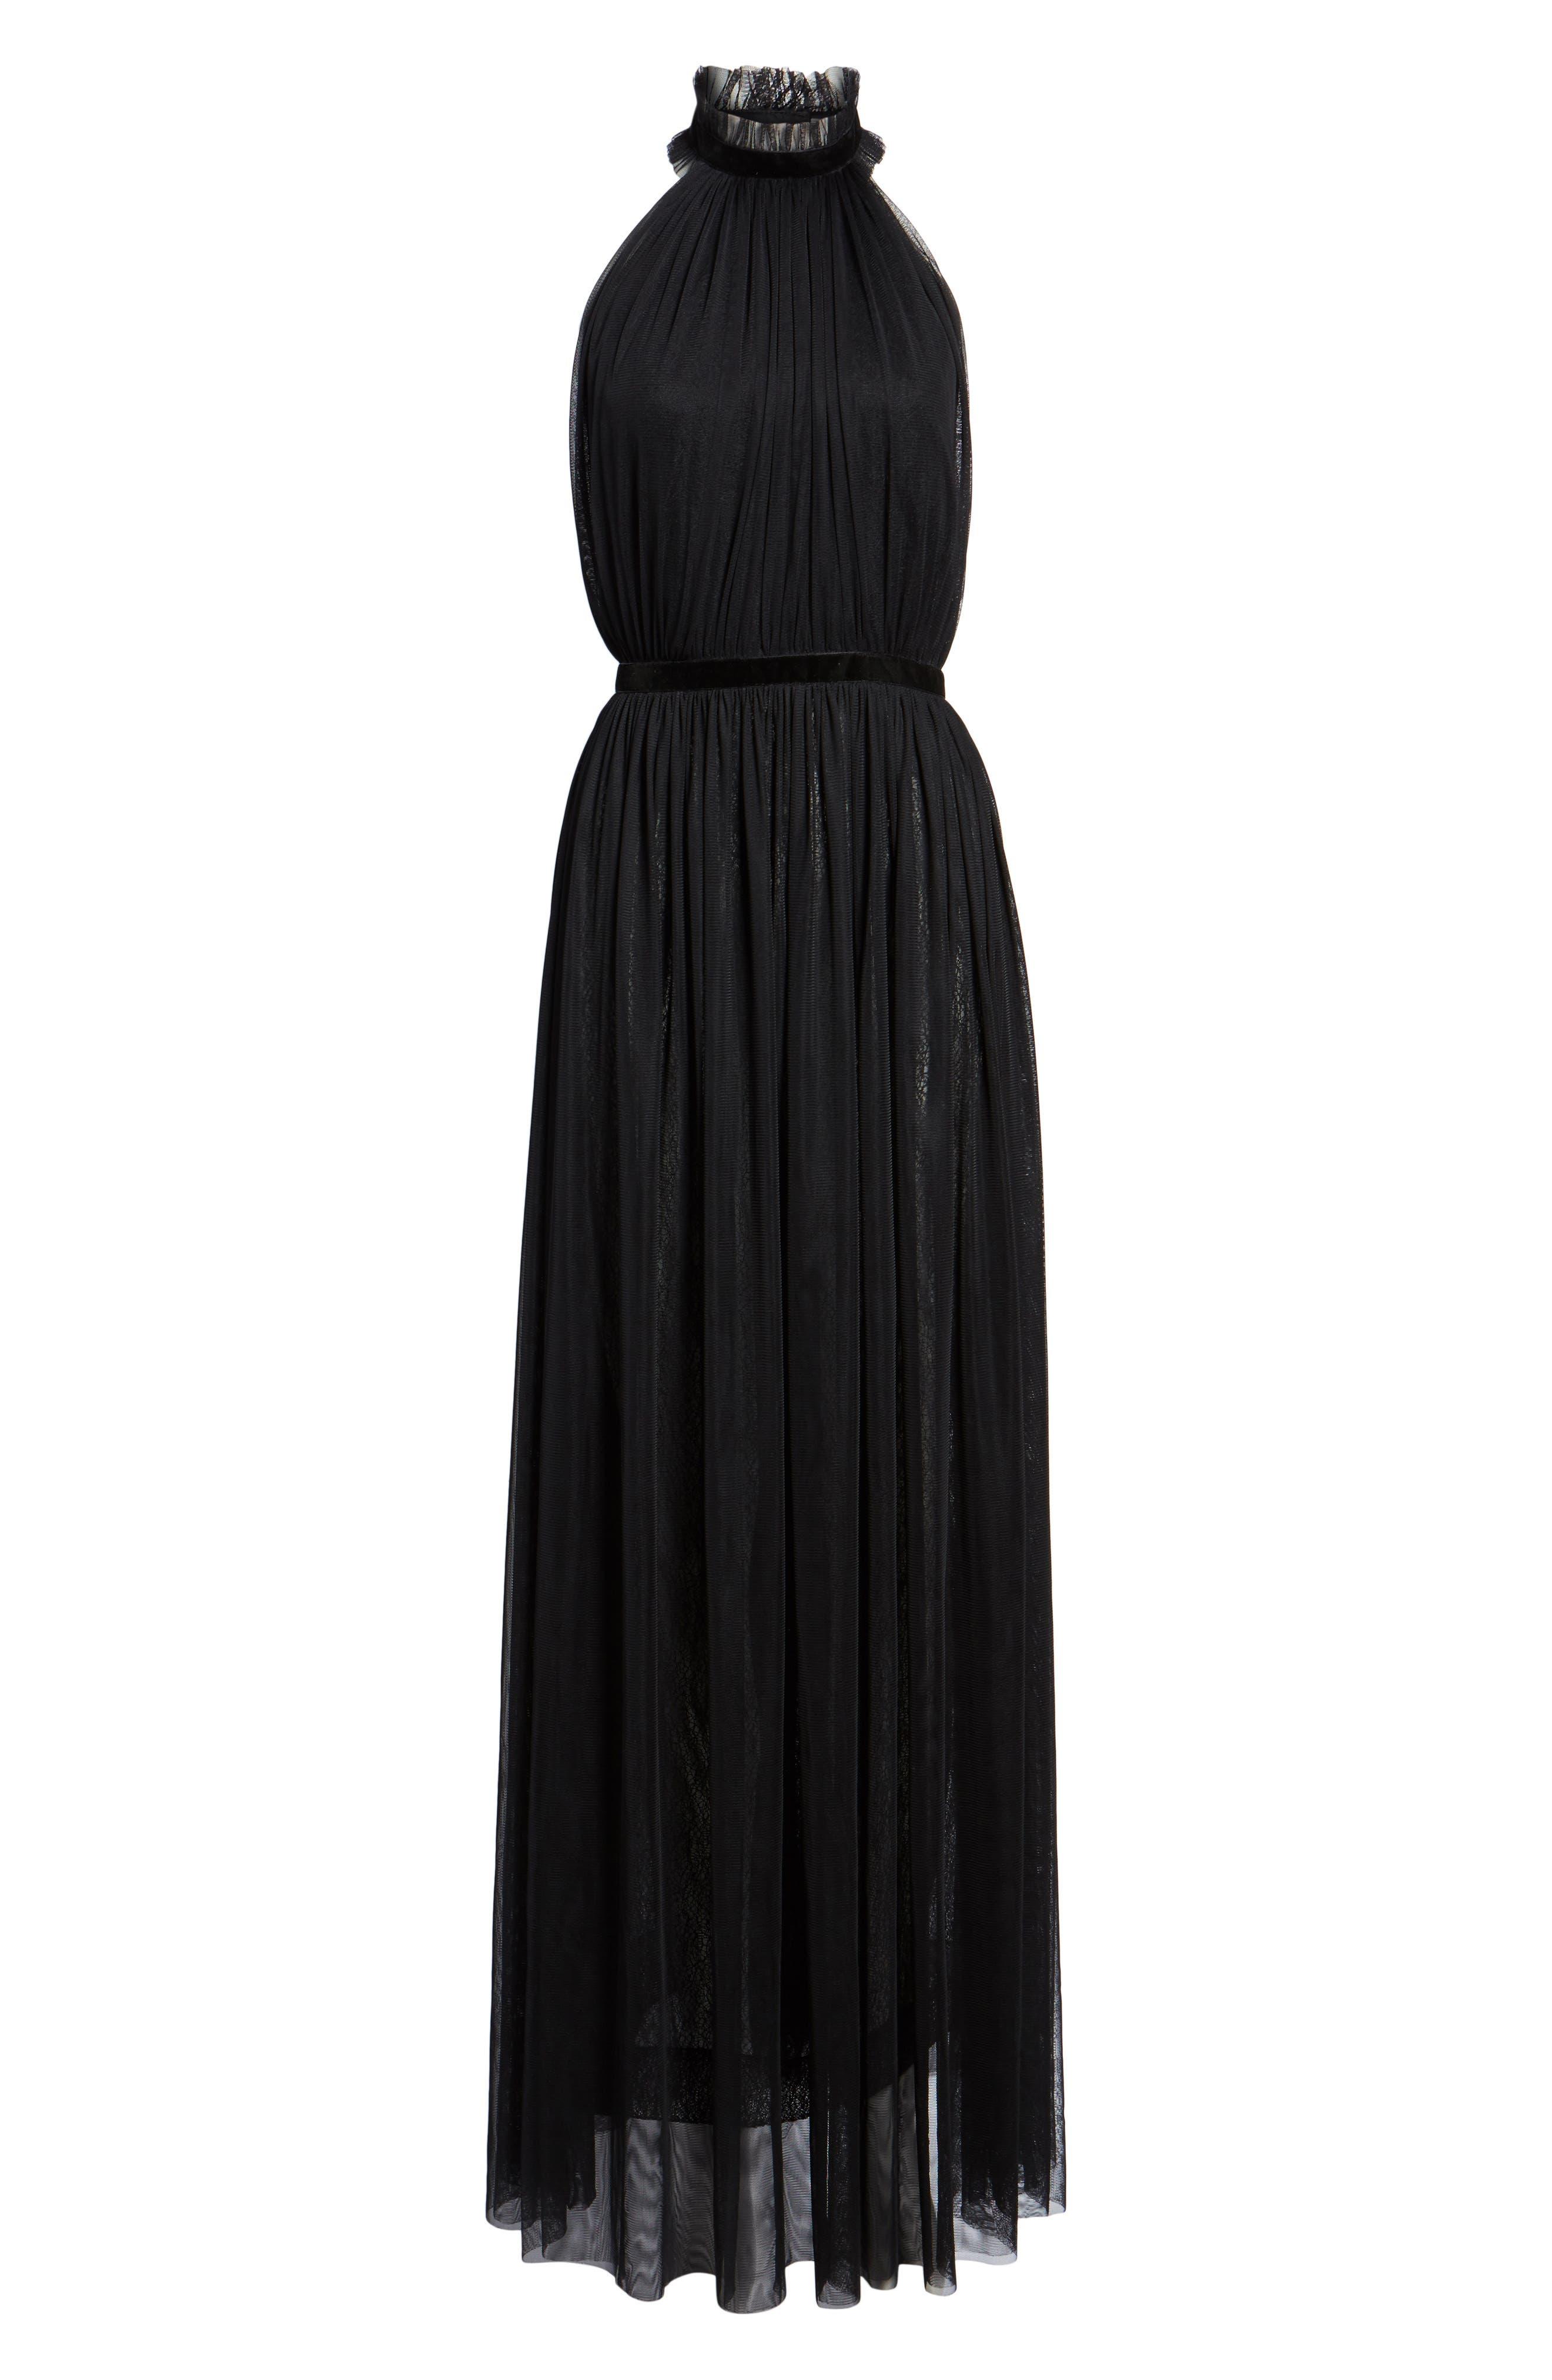 Taylor Halter Maxi Dress,                             Alternate thumbnail 6, color,                             001